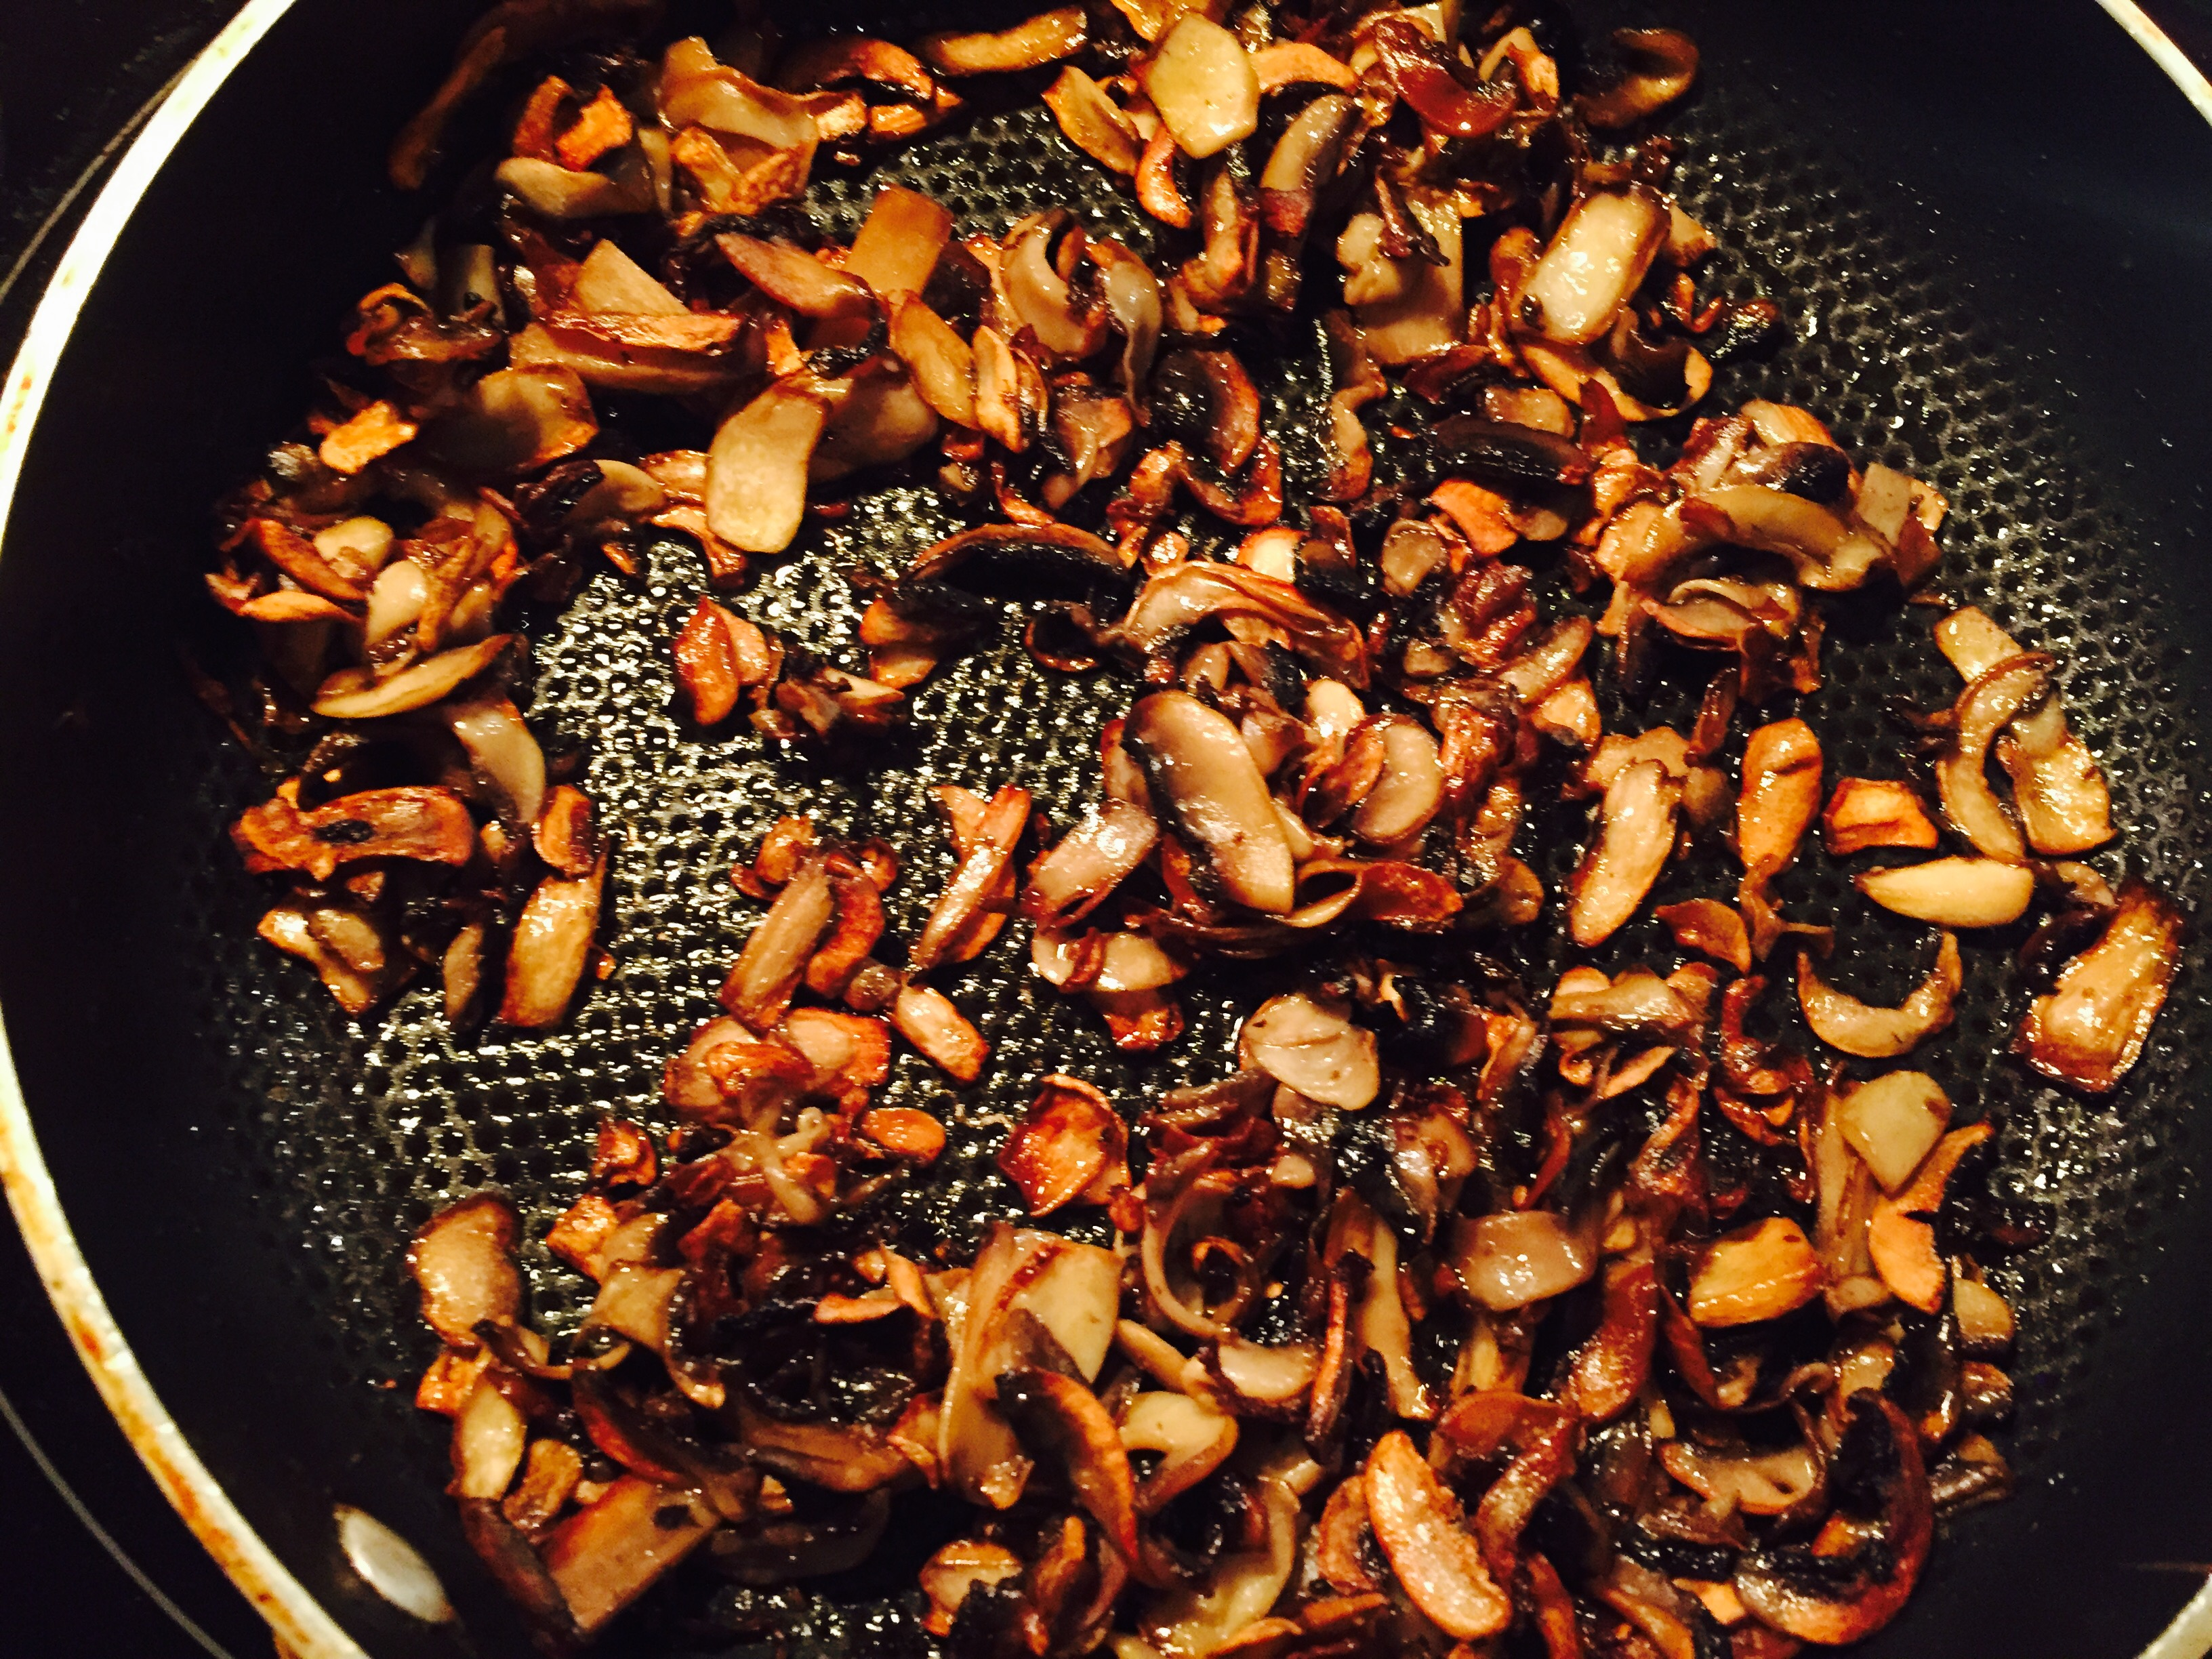 Mushrooms sautéd till golden and super flavourful